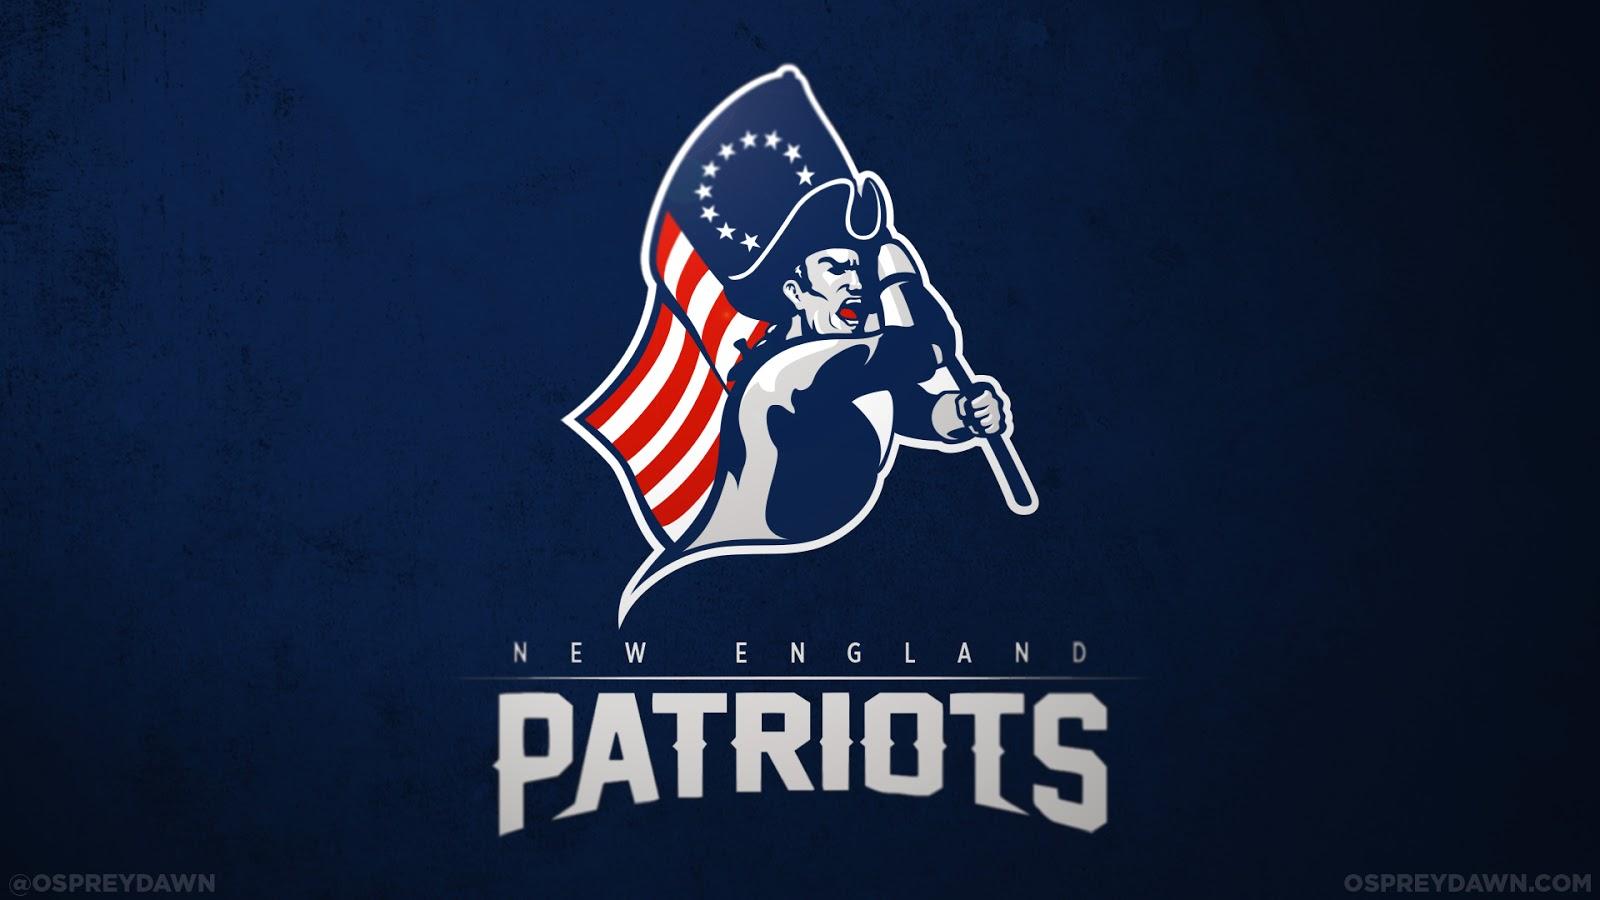 Ne Patriots Gronkowski >> Max O'Brien's NFL Logo Redesigns | Graphic Design Blog